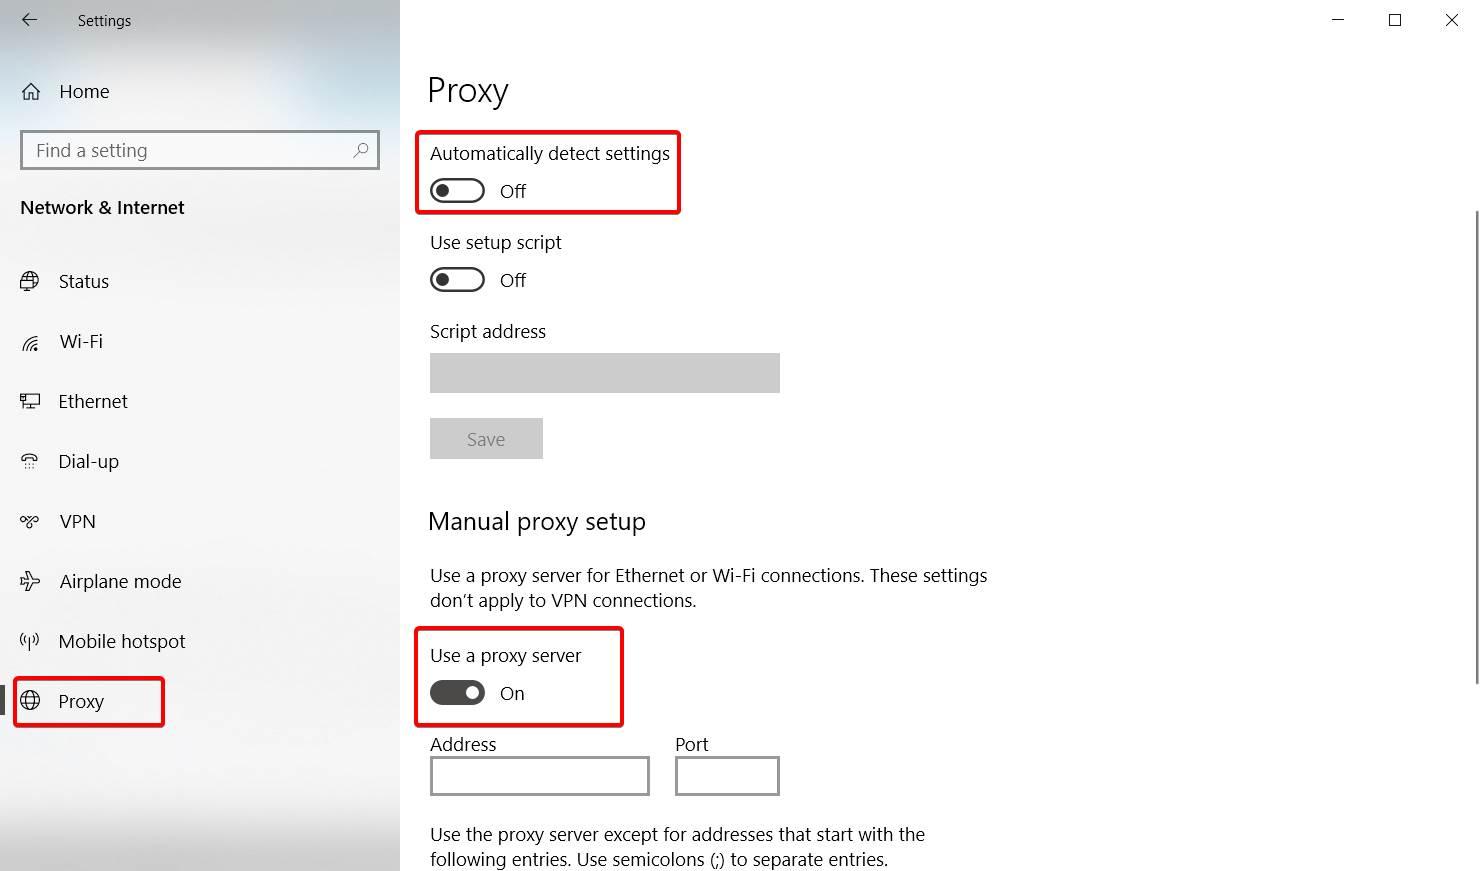 how to use custom proxy settings in windows